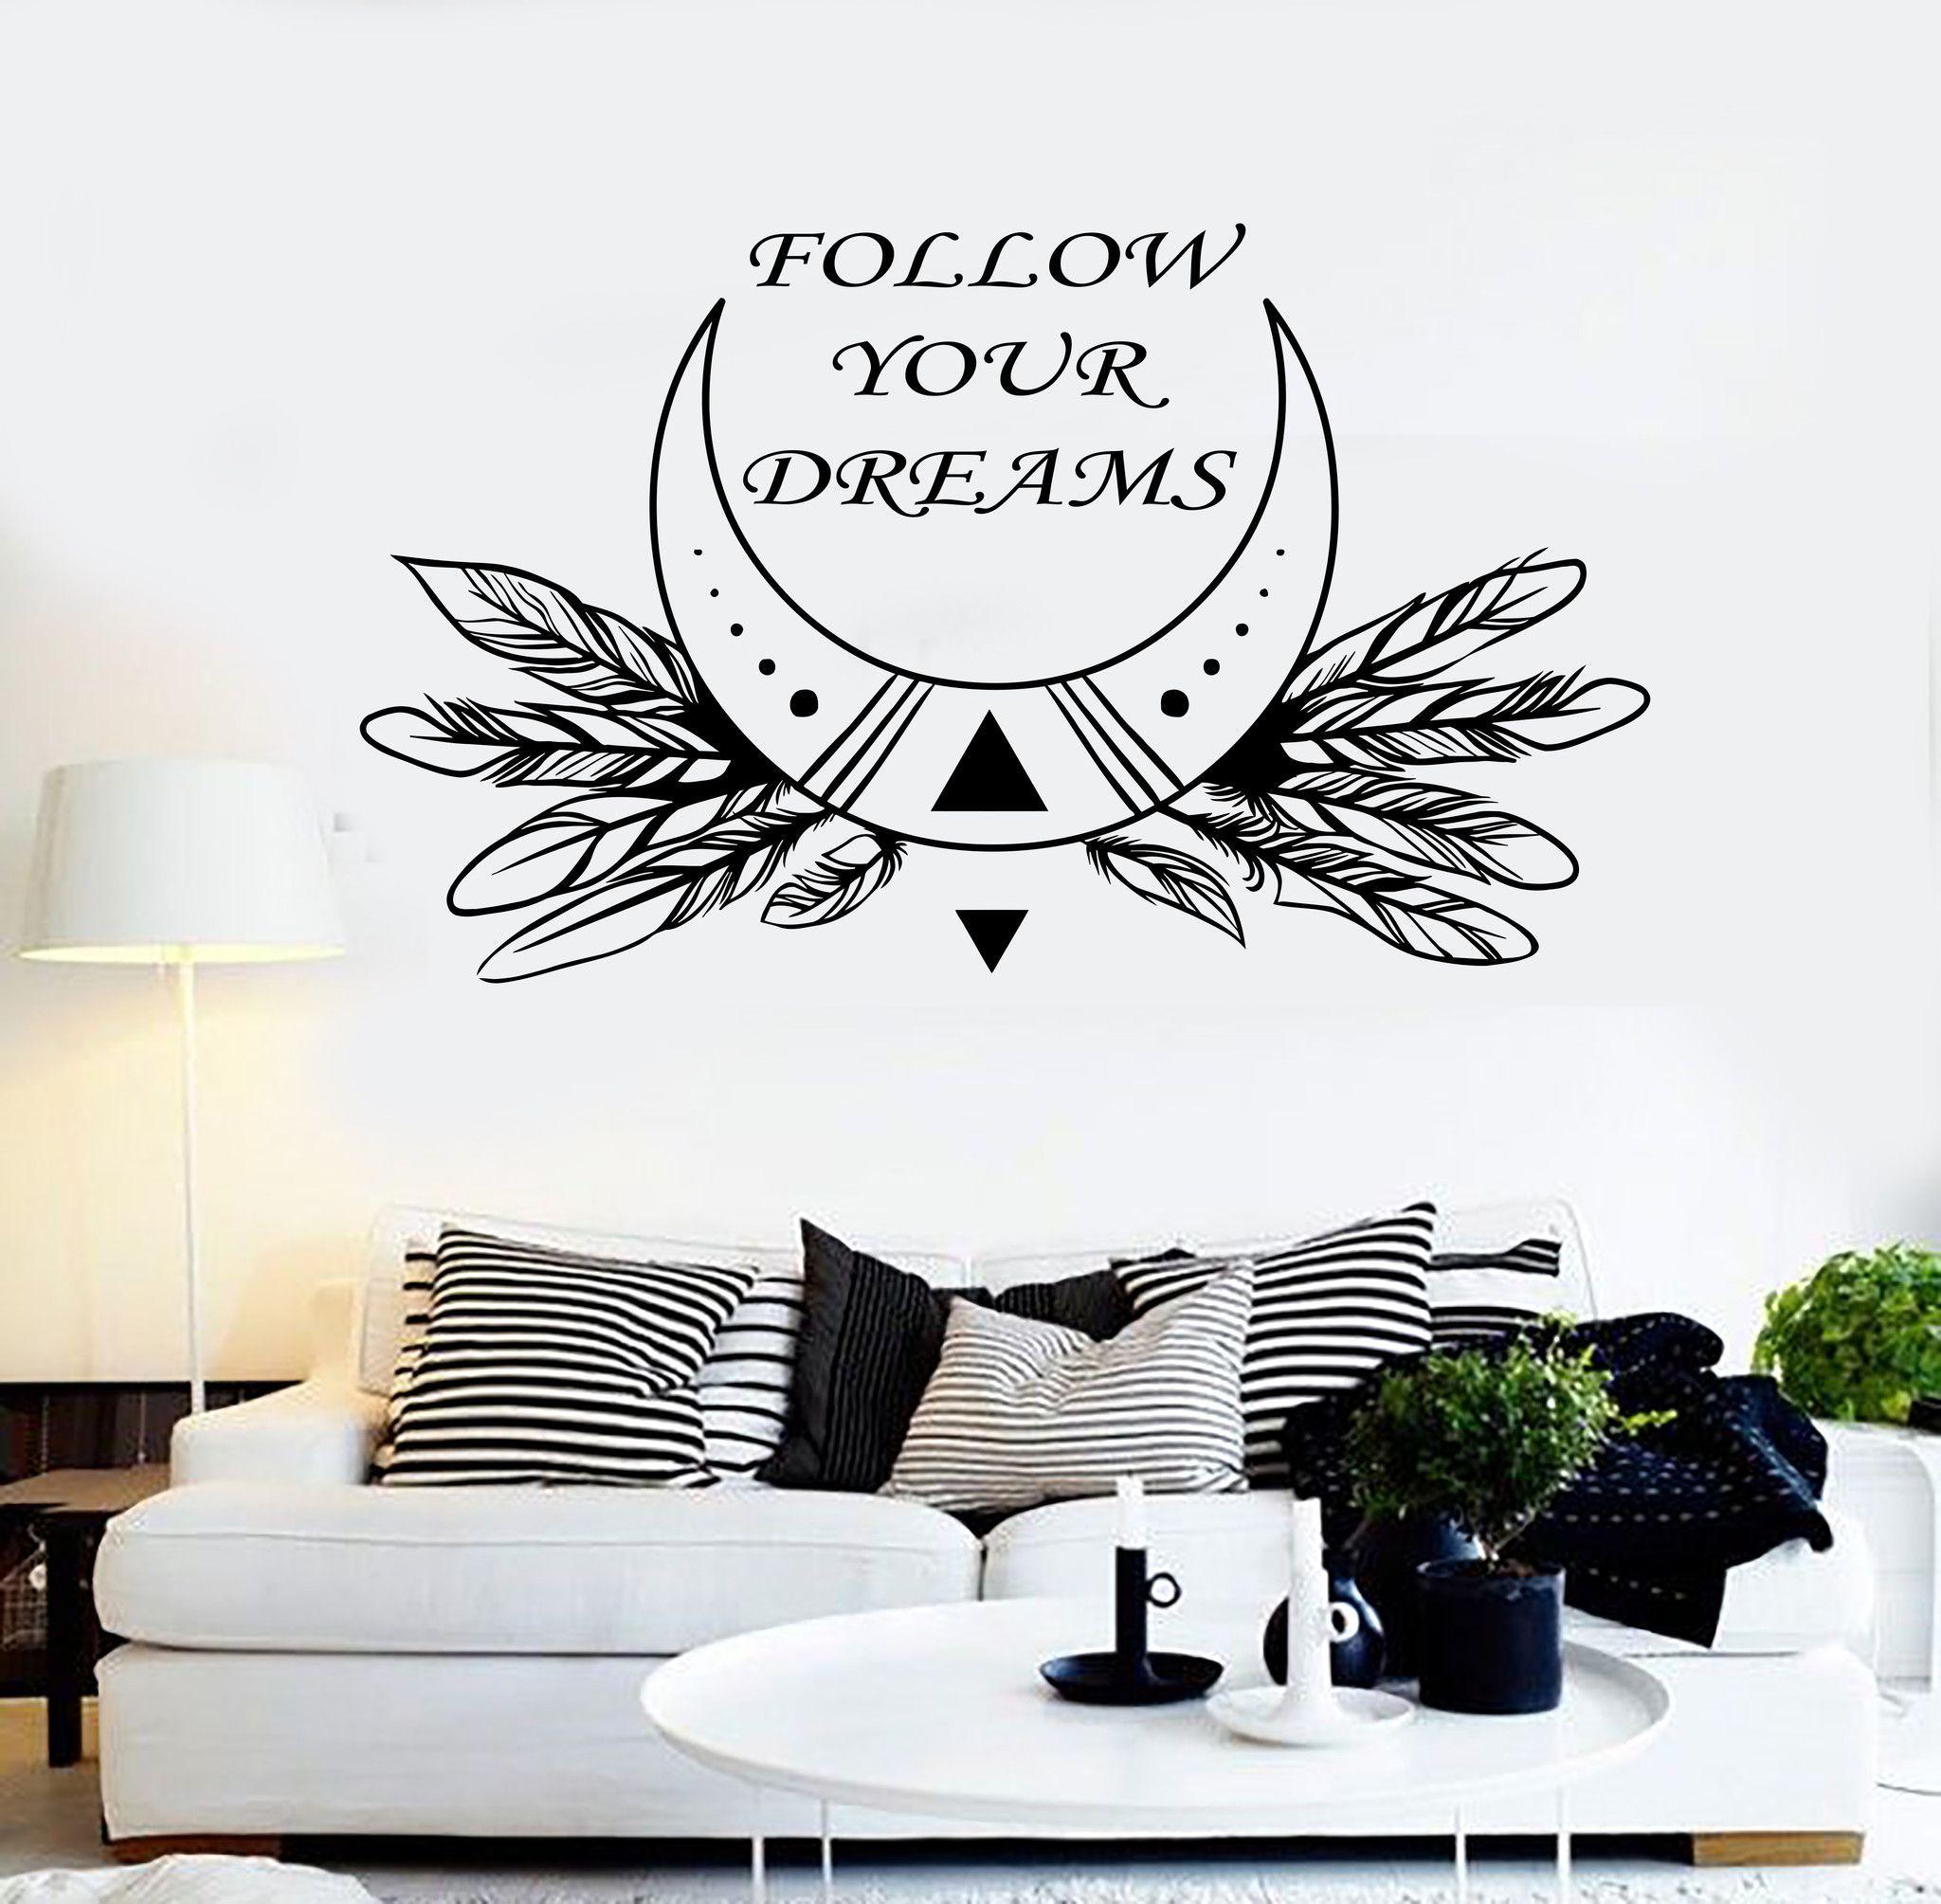 Vinyl wall decal rustic decor moon quote dreams bedroom stickers